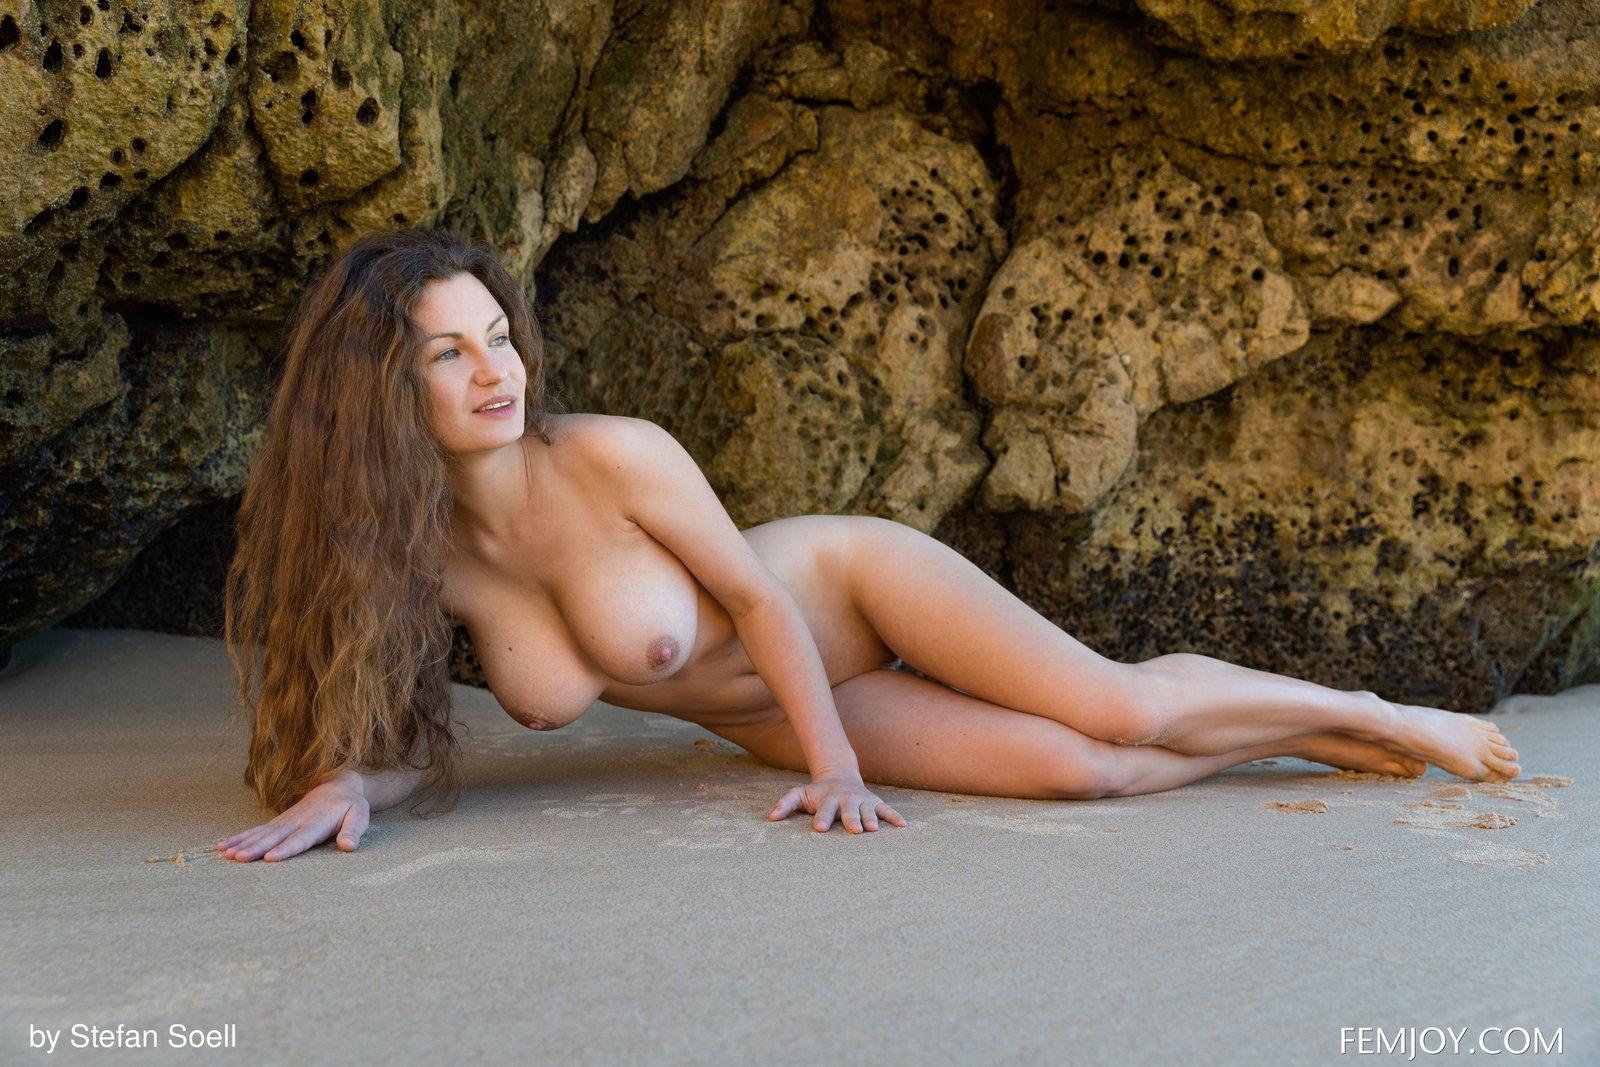 Susann In Most Beautiful By Femjoy 16 Photos  Erotic -8294